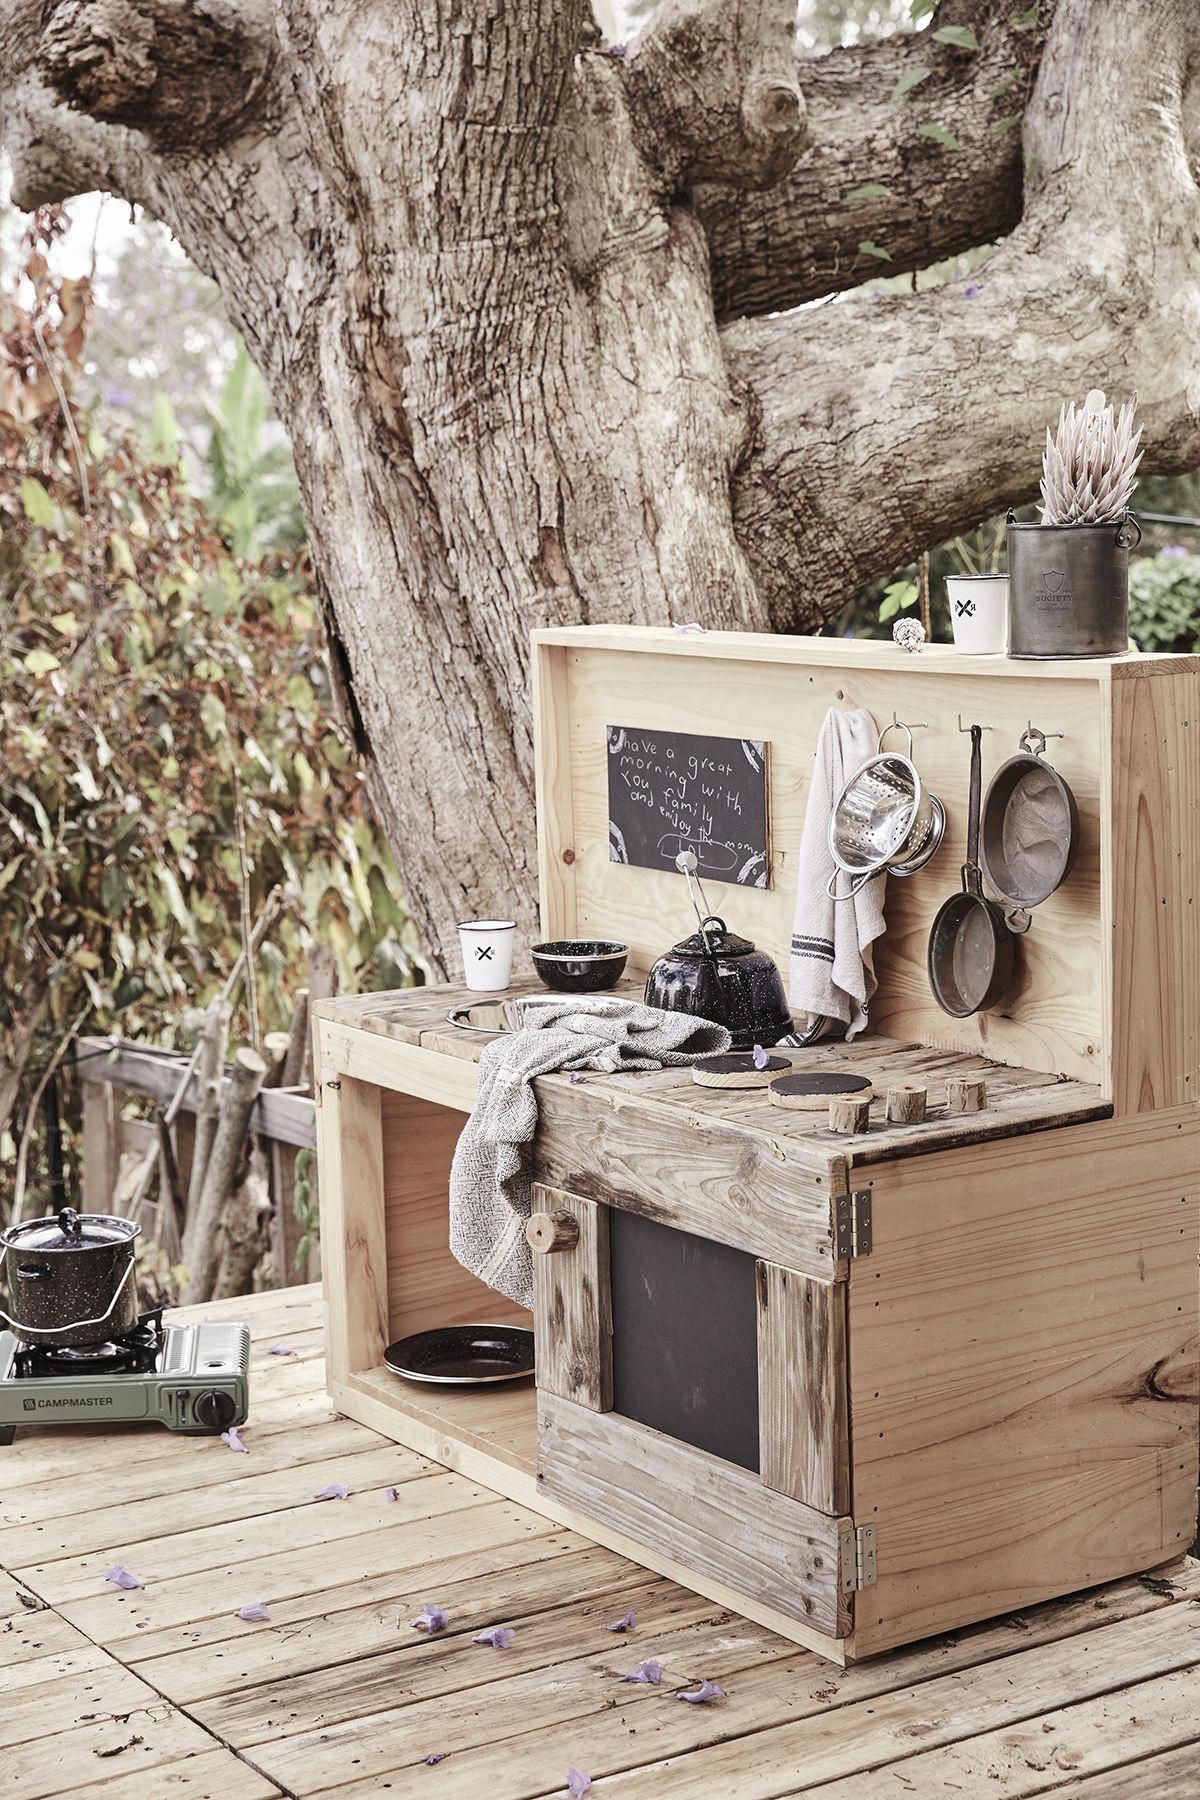 While Purchasing Outdoor Furniture You Ought To Analyze Carefully The Pieces For Firmly Wo Kinder Spielplatz Garten Kinder Garten Kinderkuche Selber Bauen